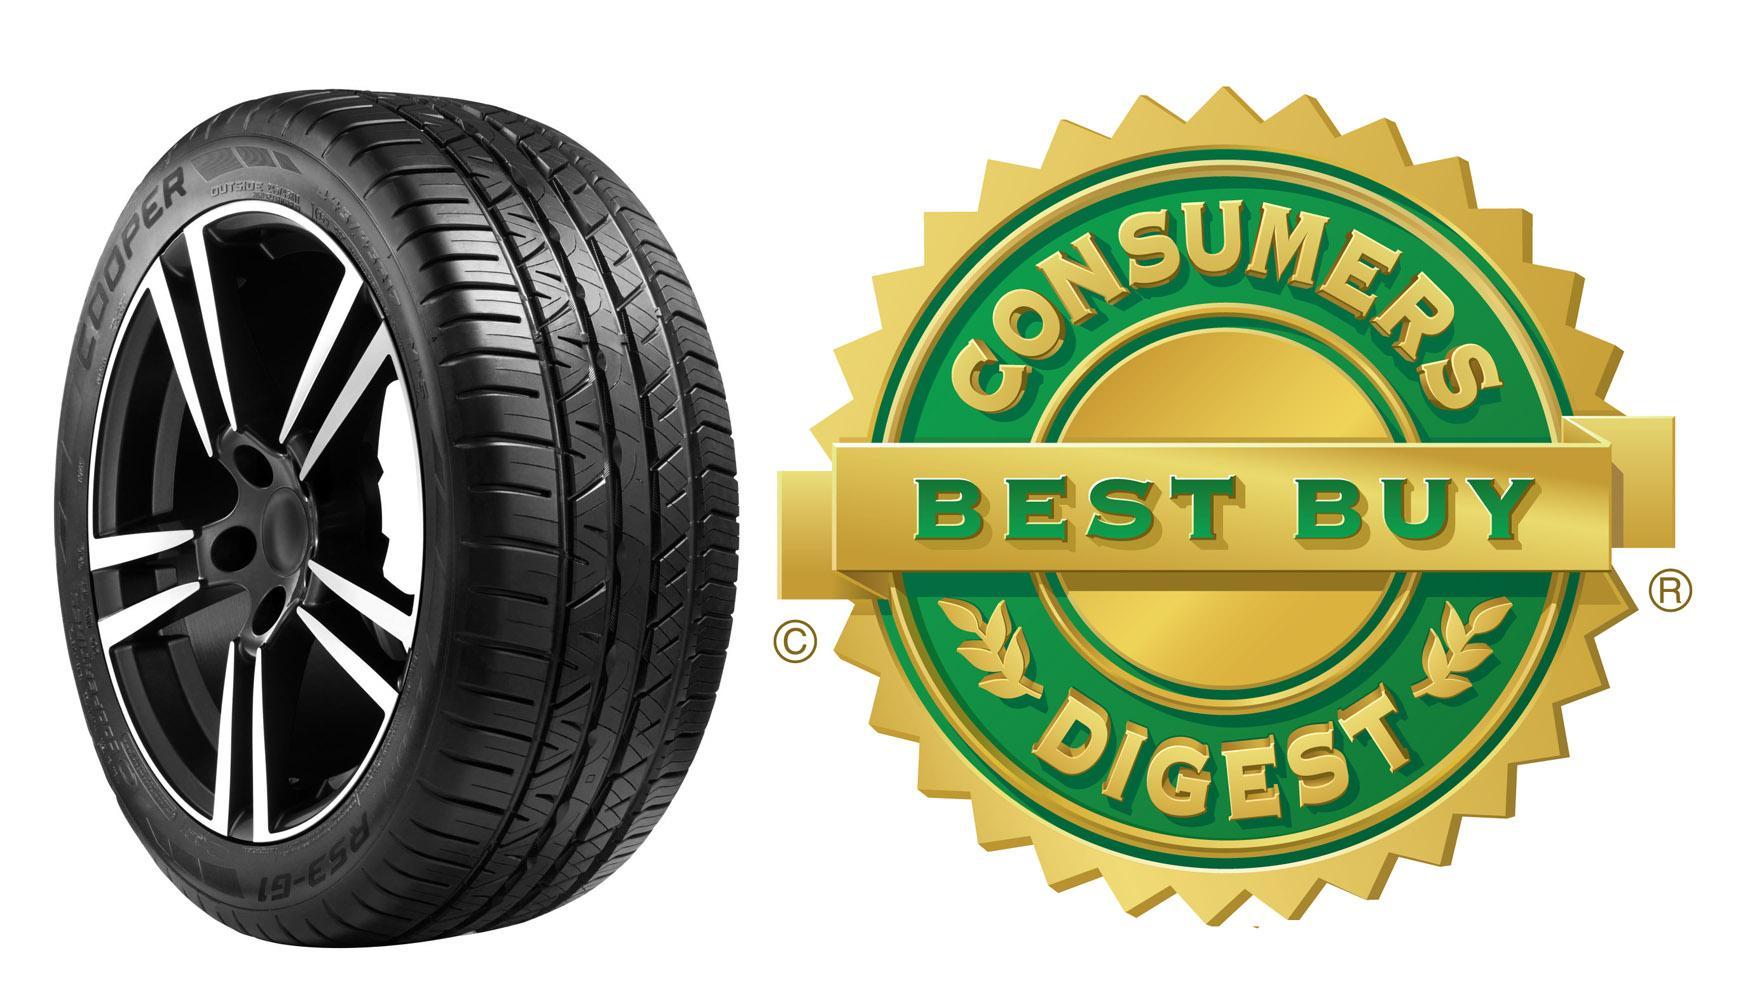 Всесезонка Cooper Zeon RS3-G1 получила премию Consumers Digest Best Buy Award 2018